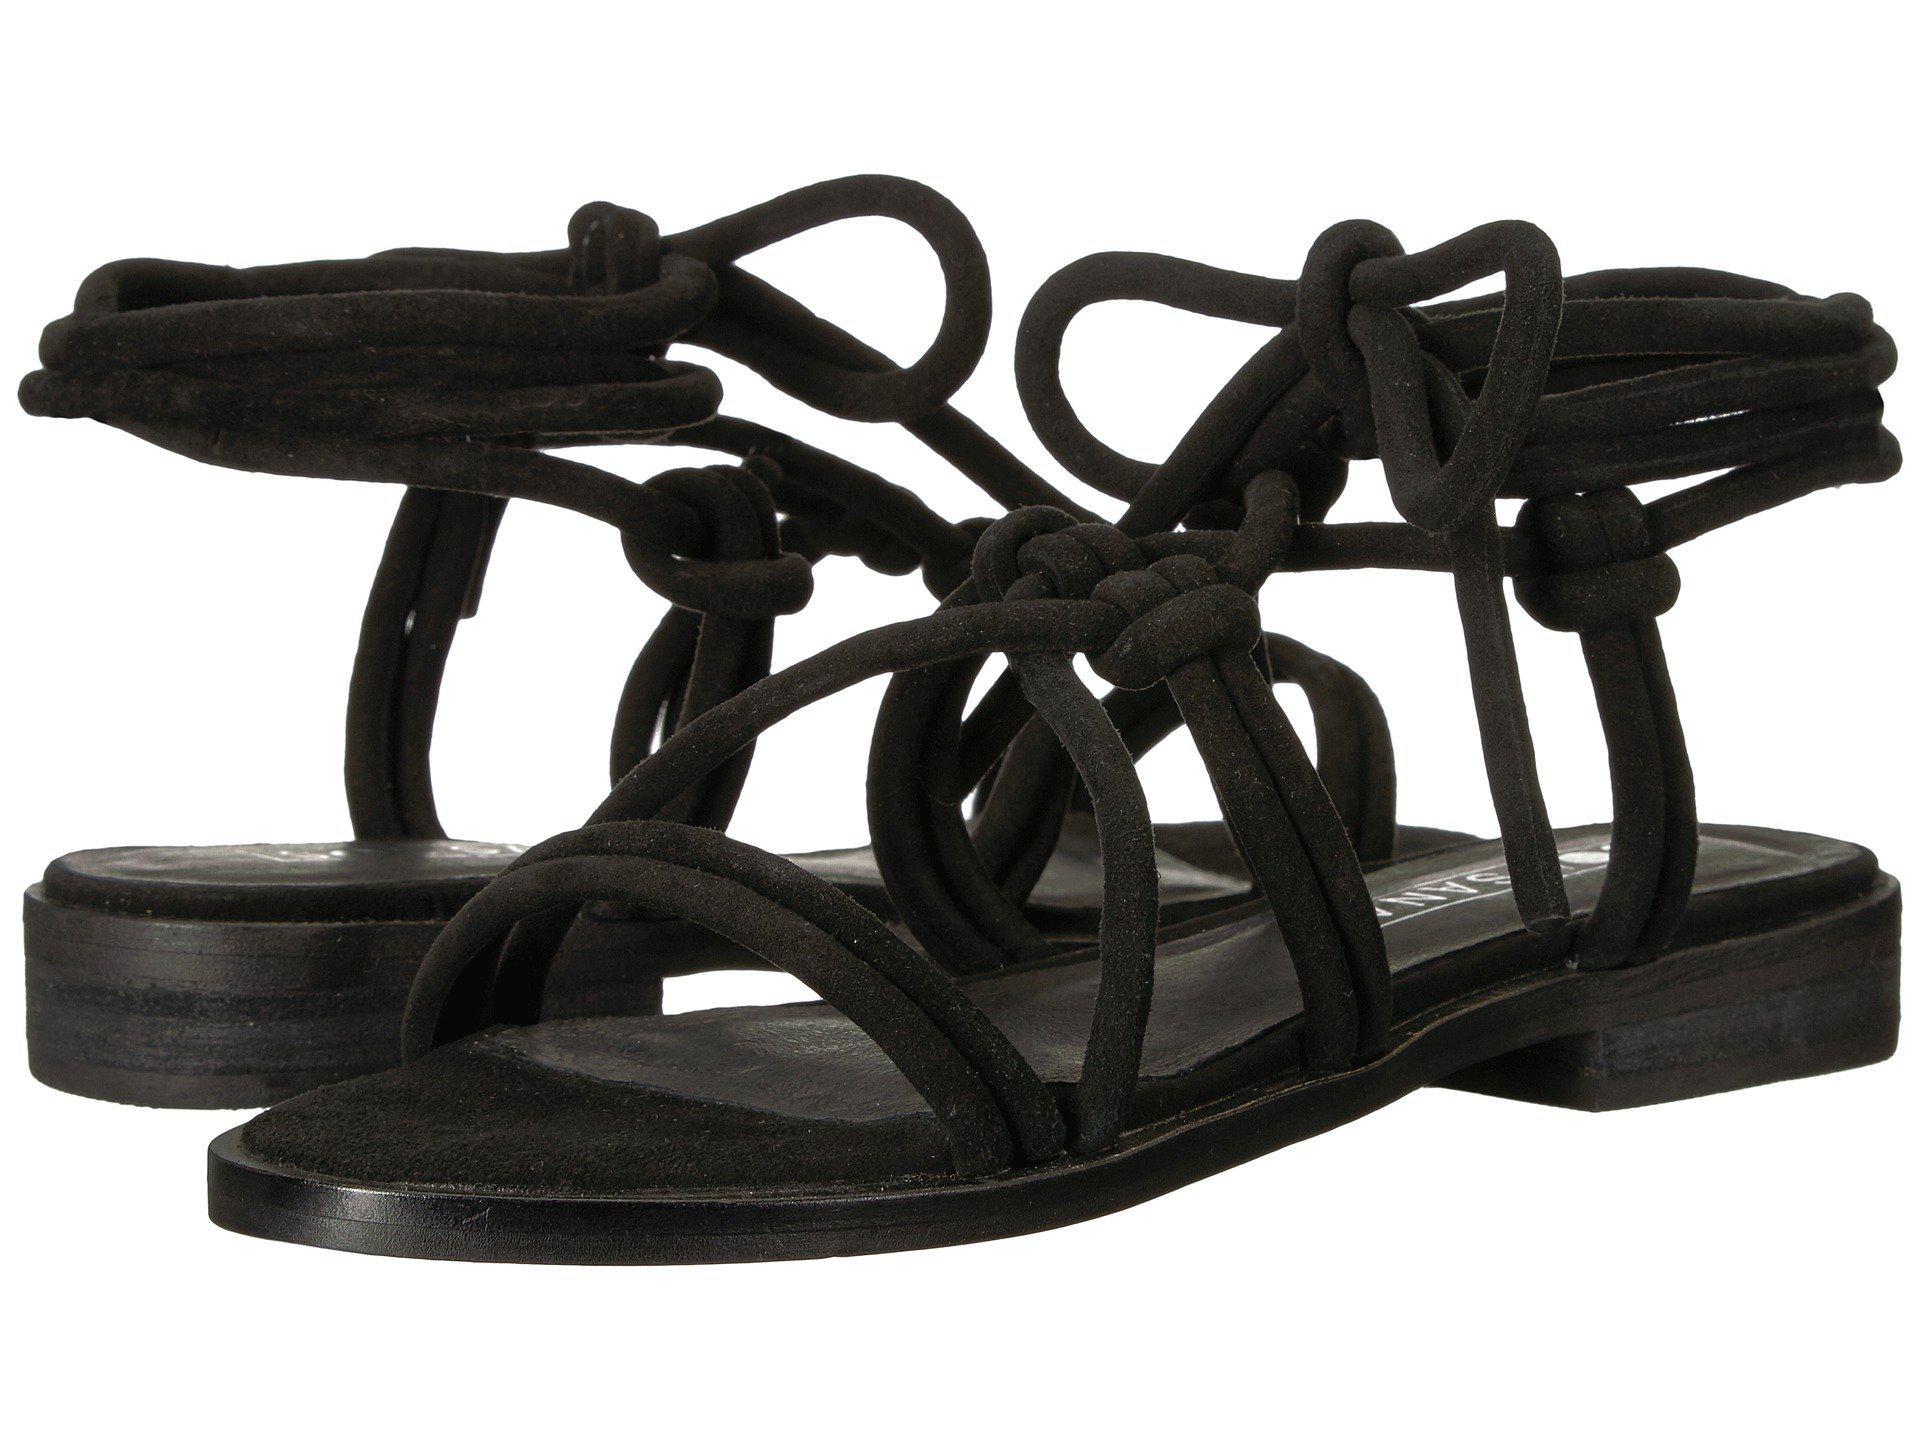 1907763e2d06 Lyst - Sol Sana Kip Sandal in Black - Save 50%